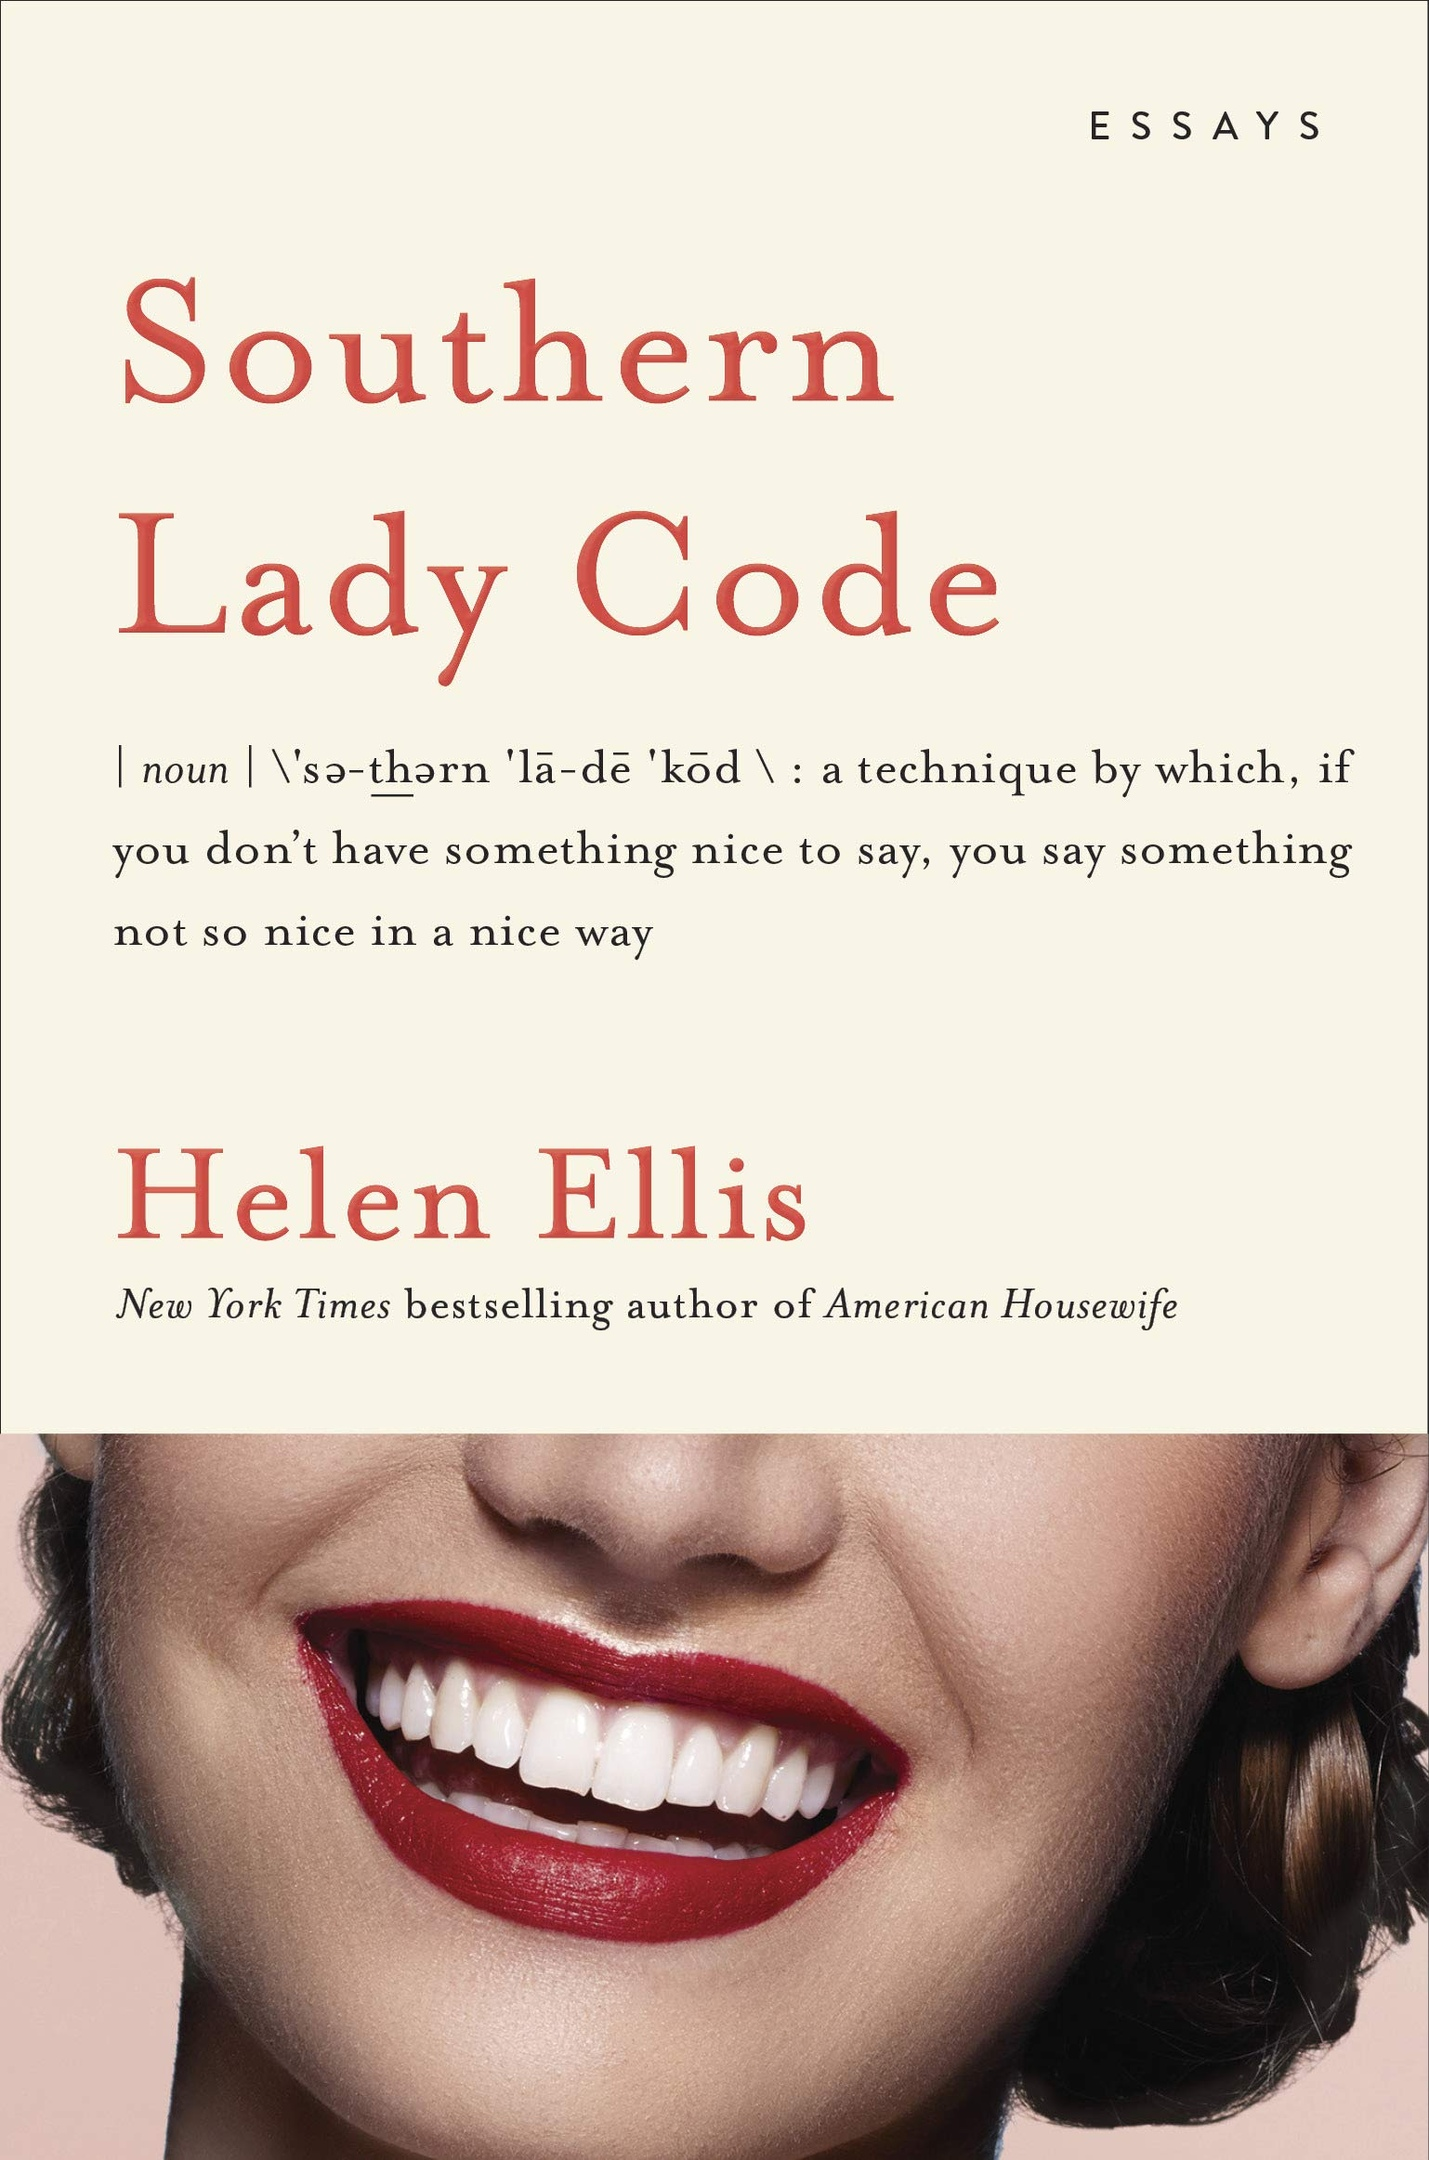 Helen Ellis – Southern Lady Code Genre: